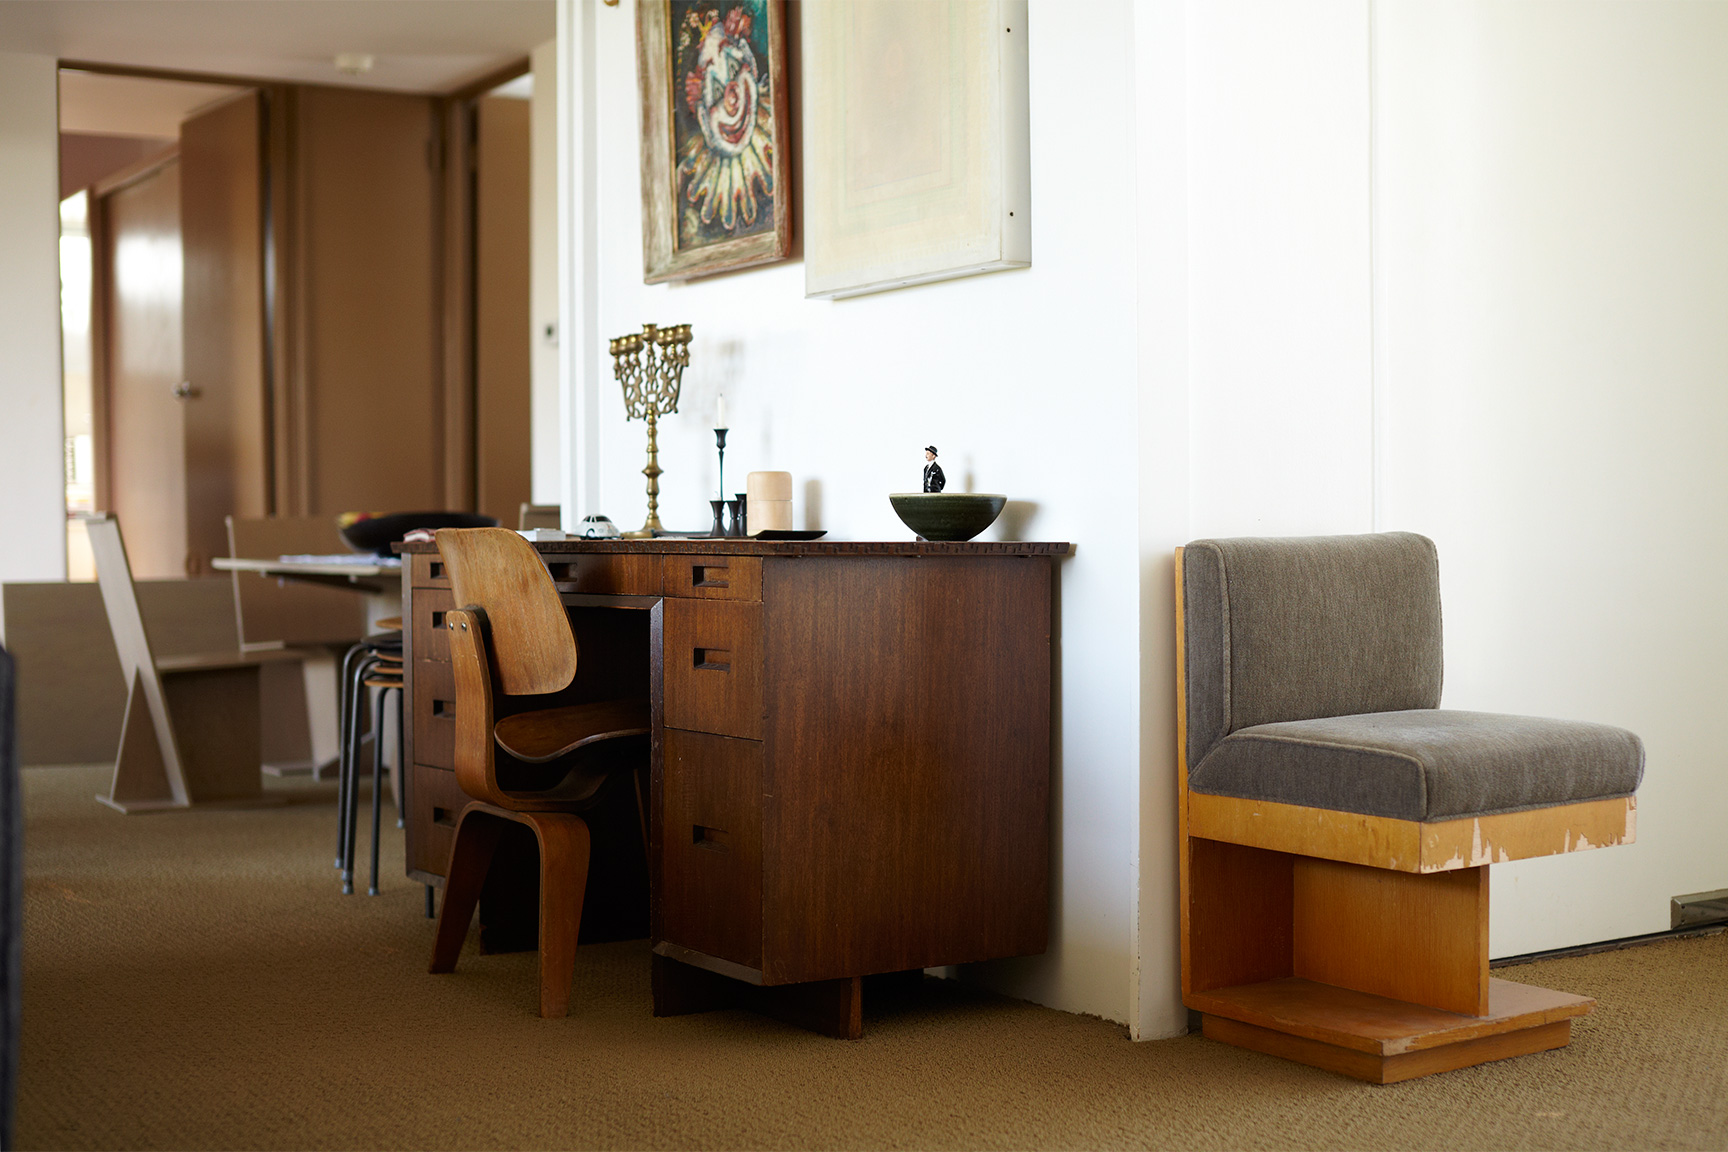 Rudolph Schindler home, Midcentury home, Echo Park, OK Store, Larry Schaffer